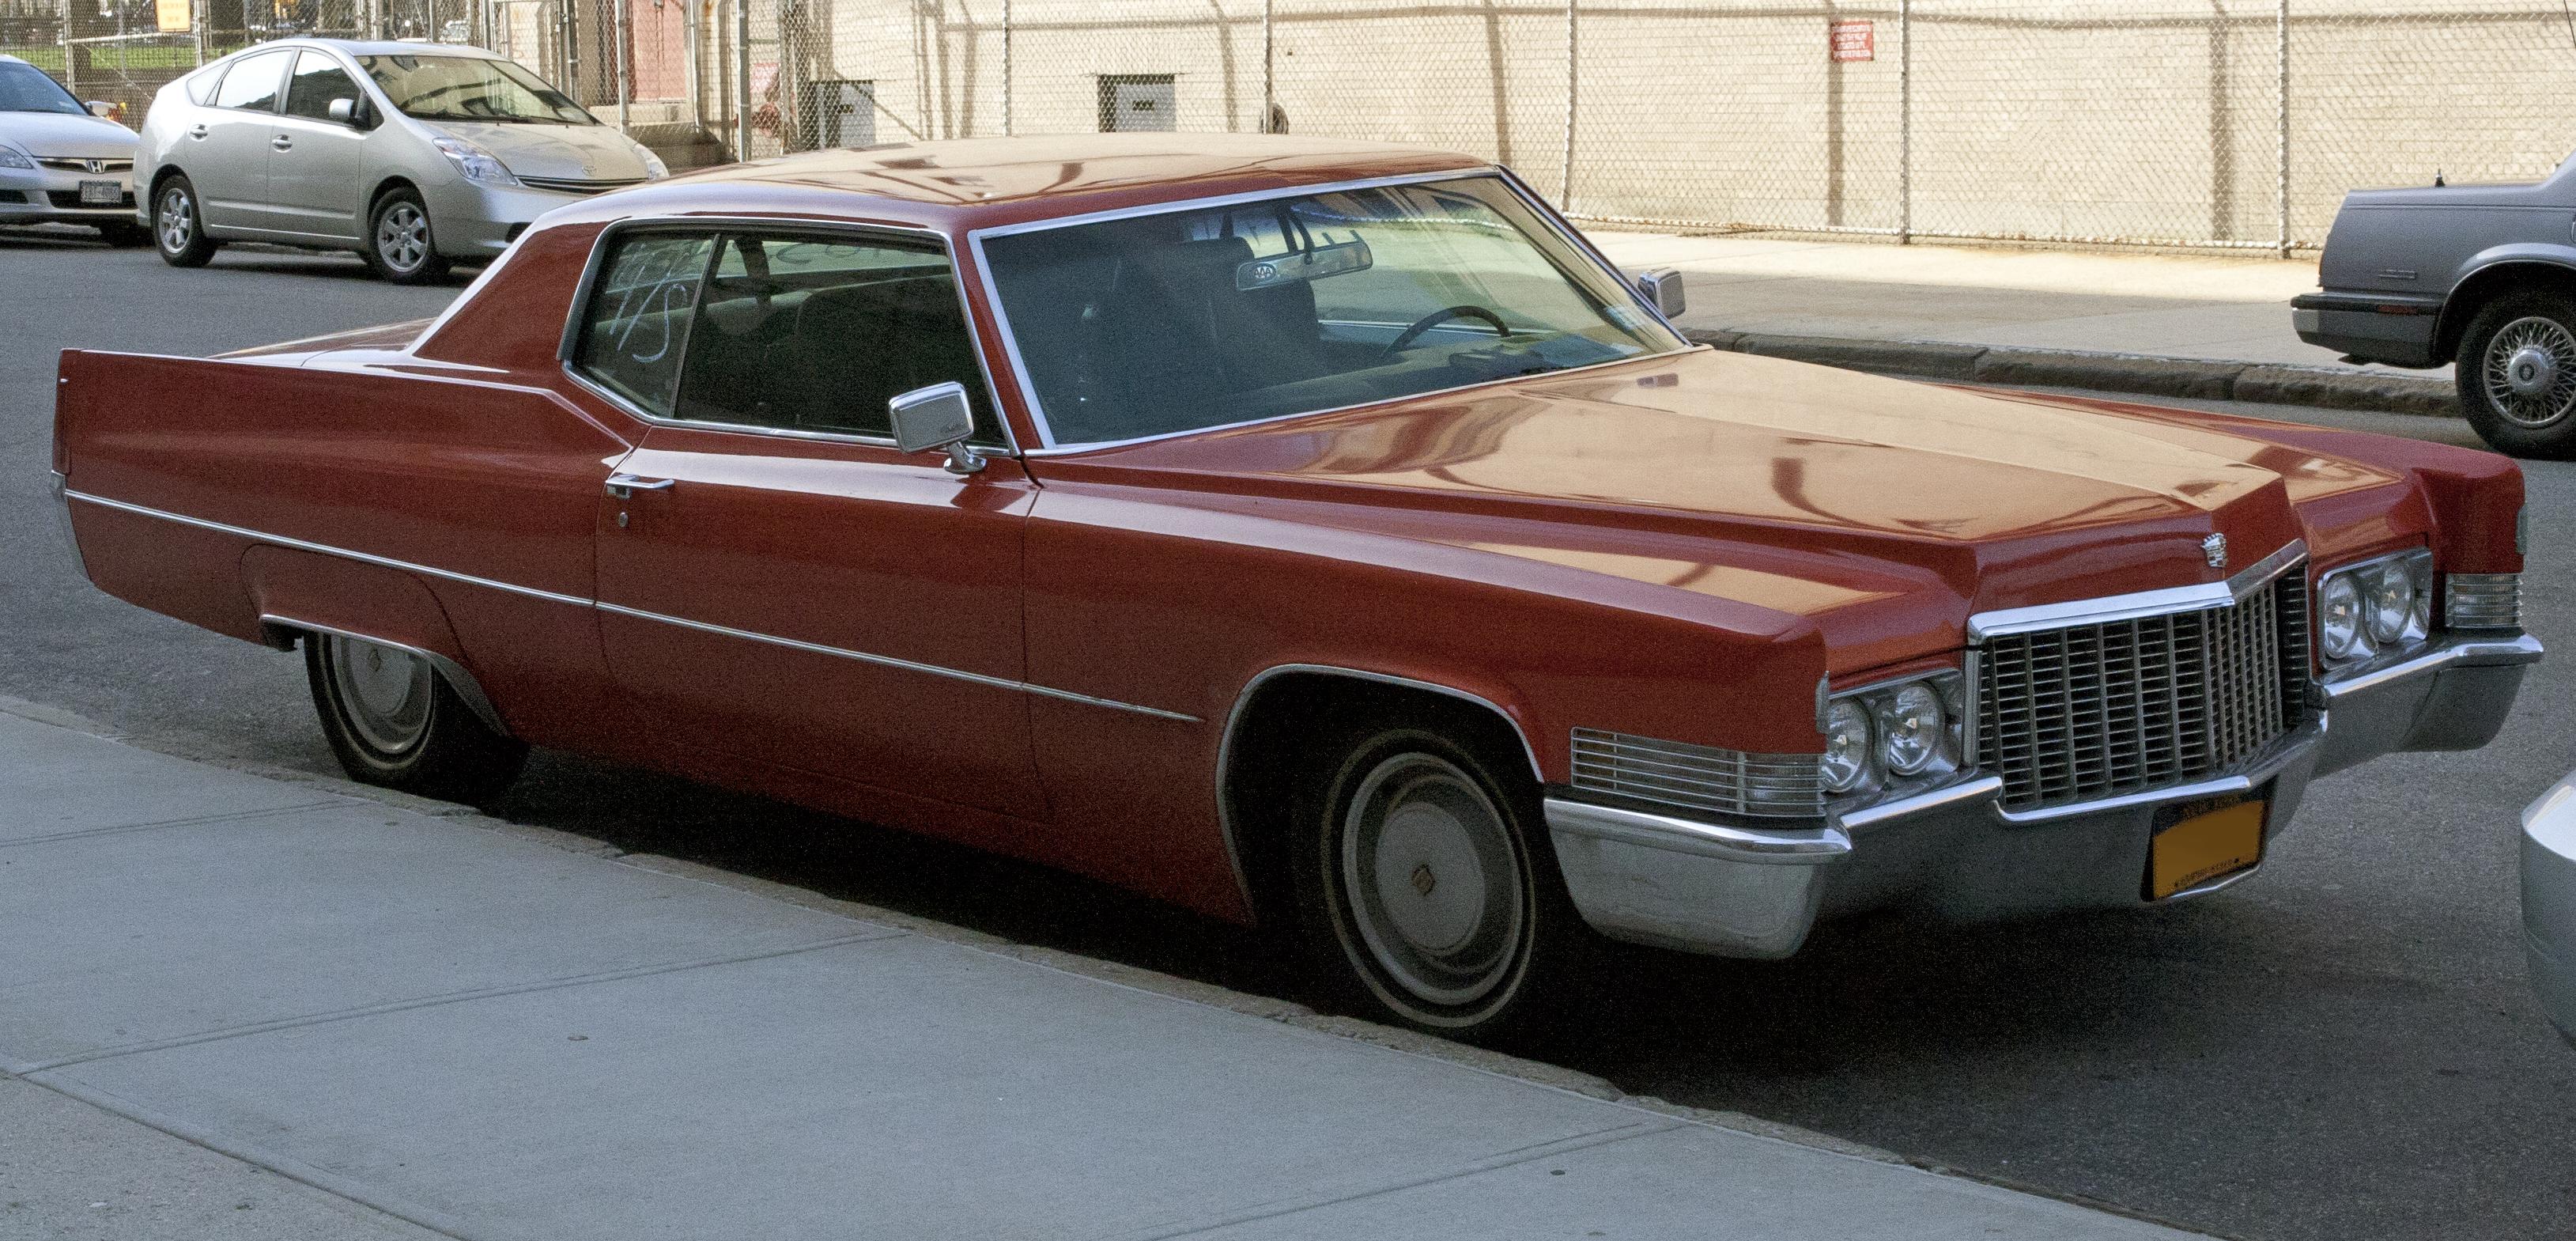 File:1970 Cadillac Coupé de Ville, bklyn.jpg - Wikimedia Commons